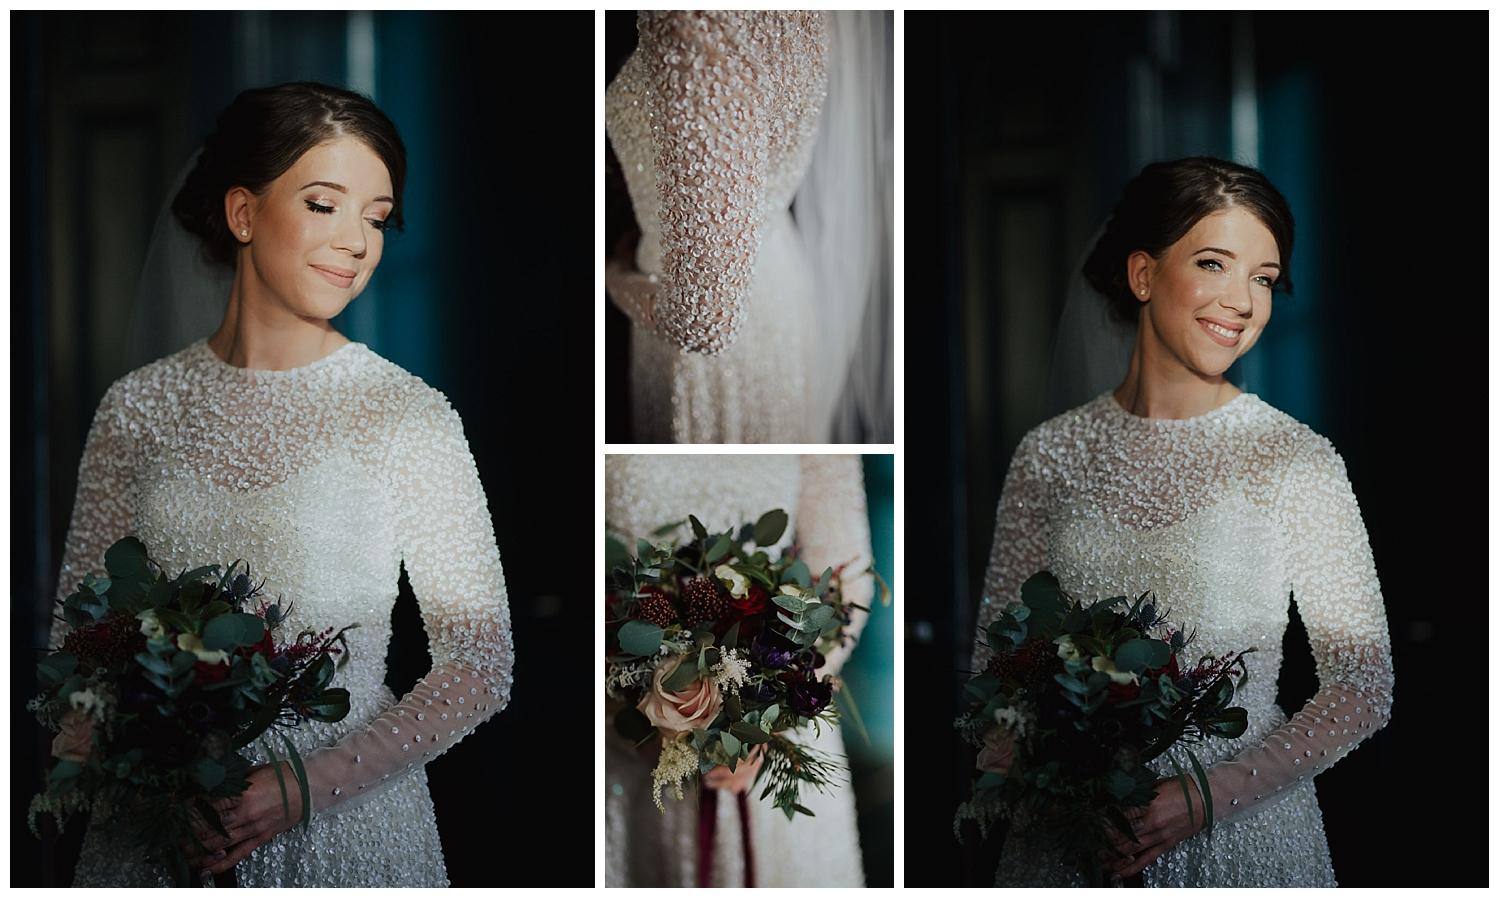 bellinter_house_wedding_livia_figueiredo_61.jpg